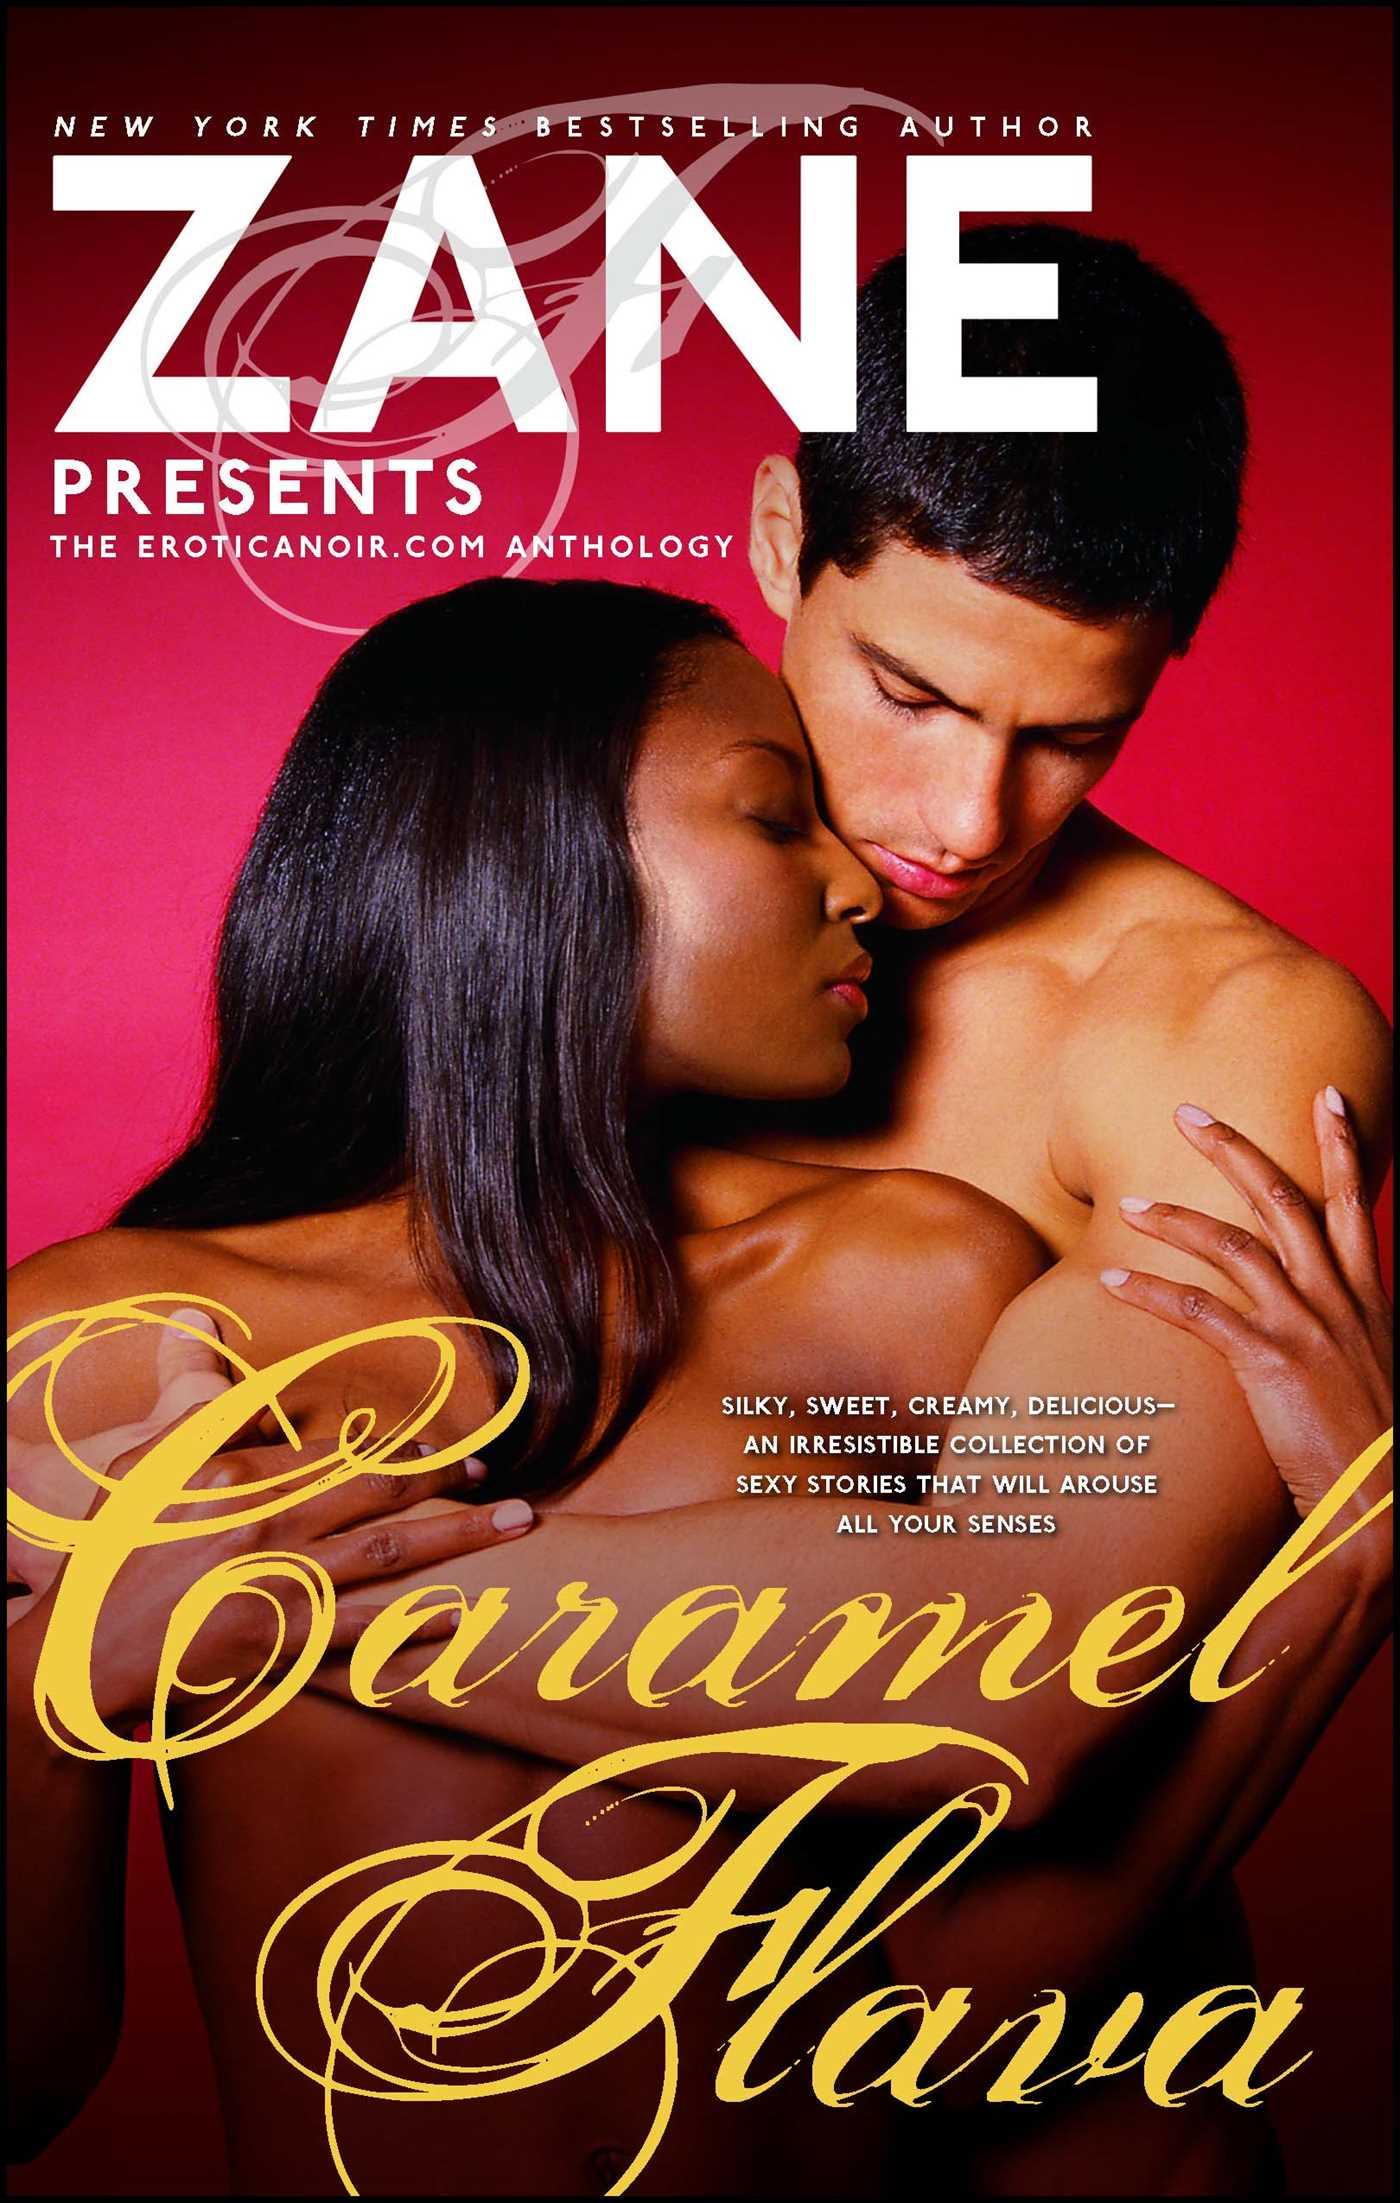 Book Cover Image (jpg): Caramel Flava